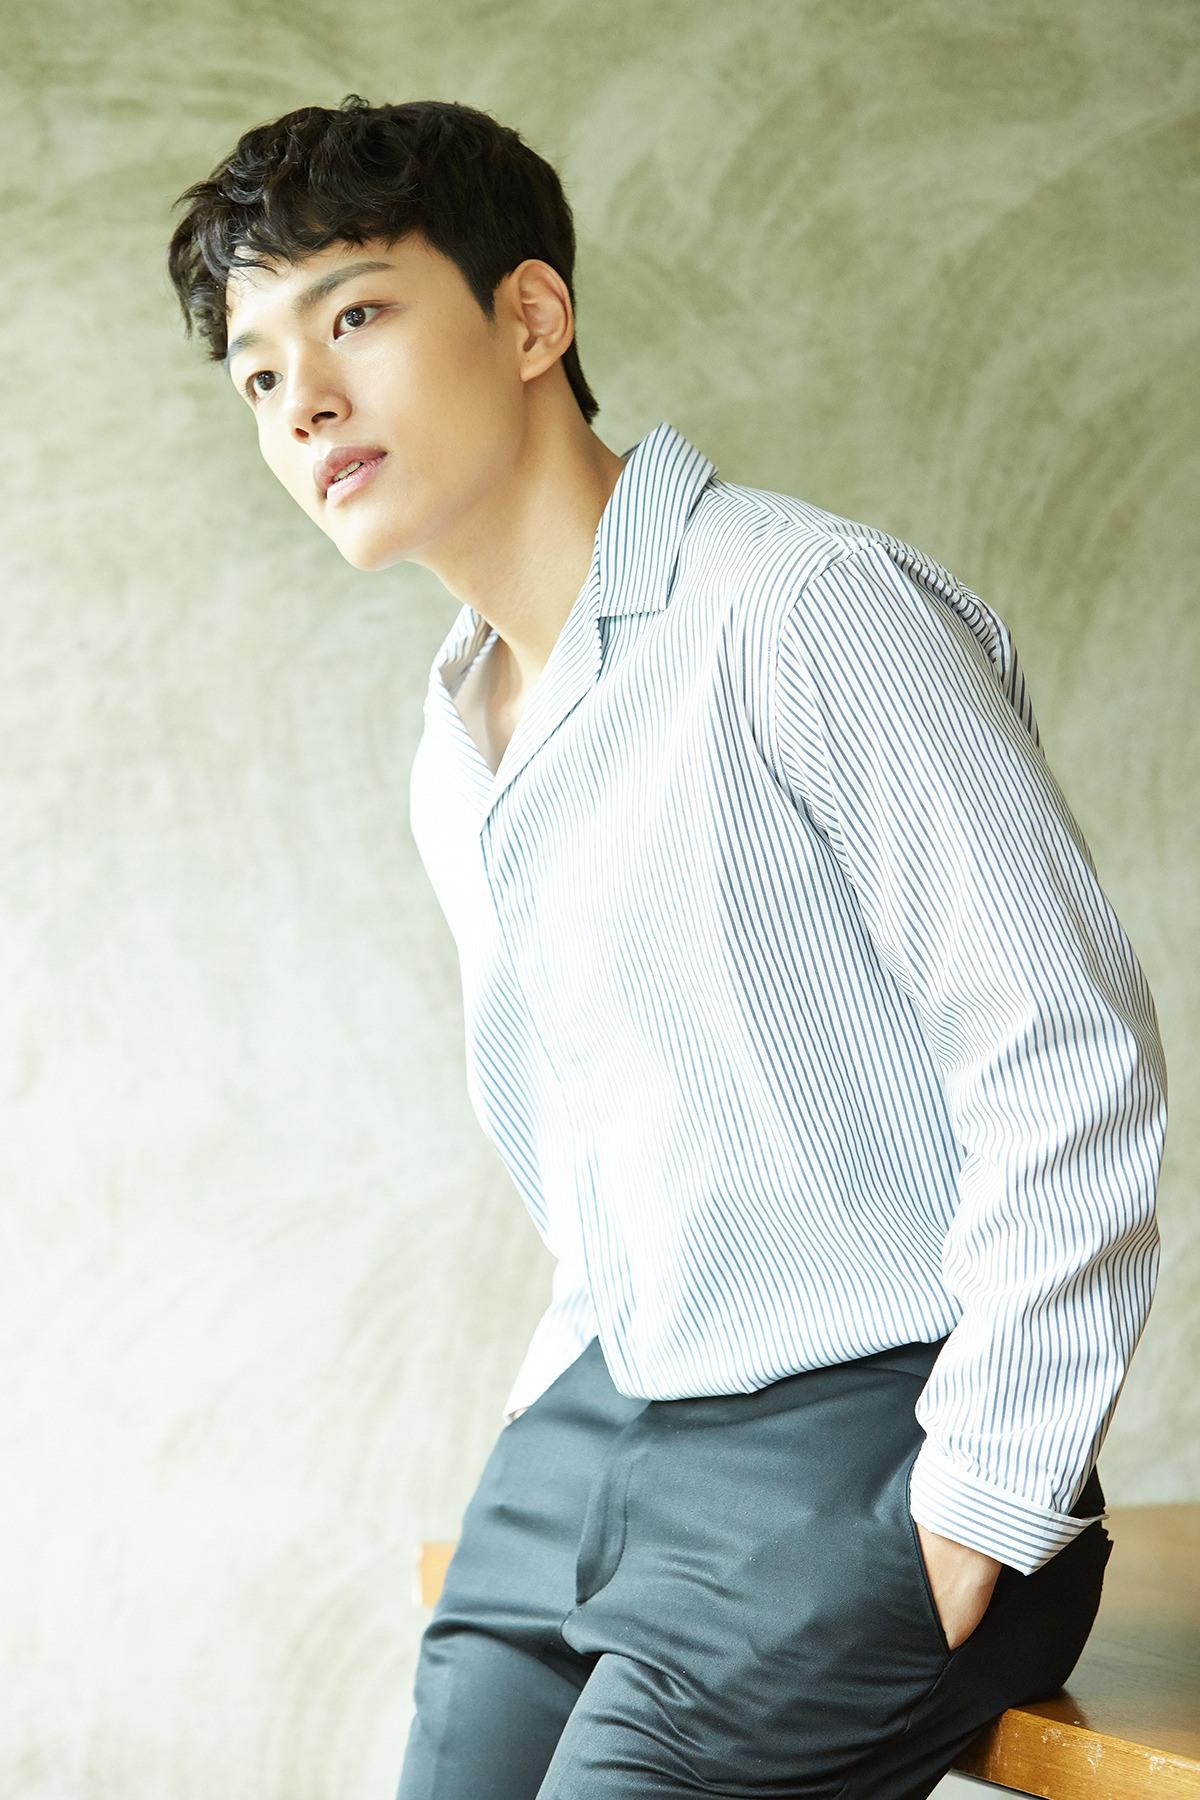 Jin goo dating